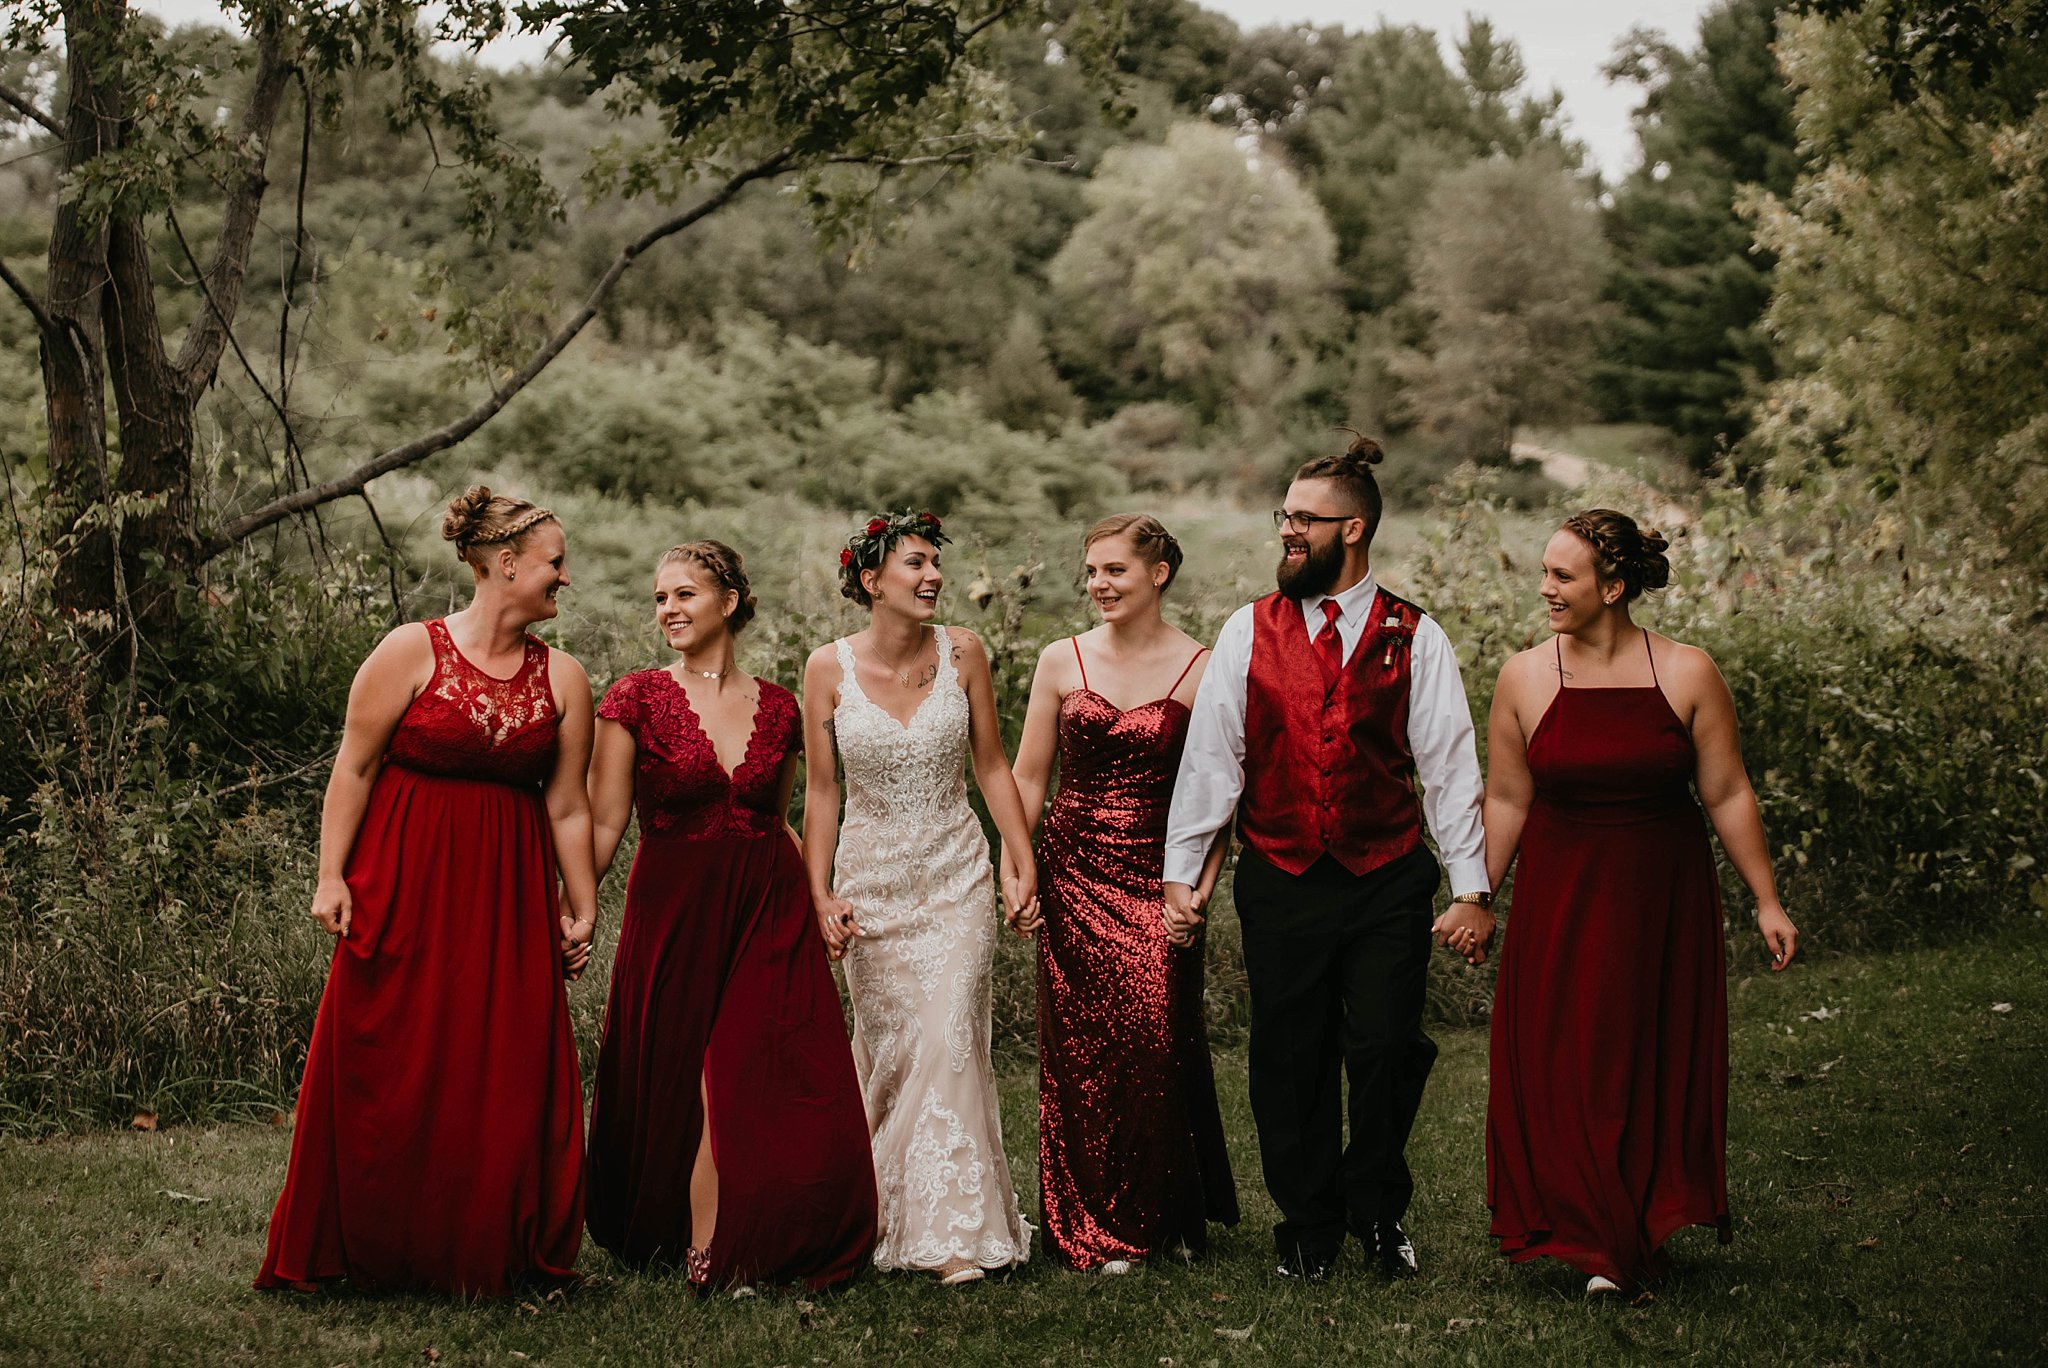 DesMoines-Iowa-Wedding-Photography-Destination-Photographer_0142.jpg